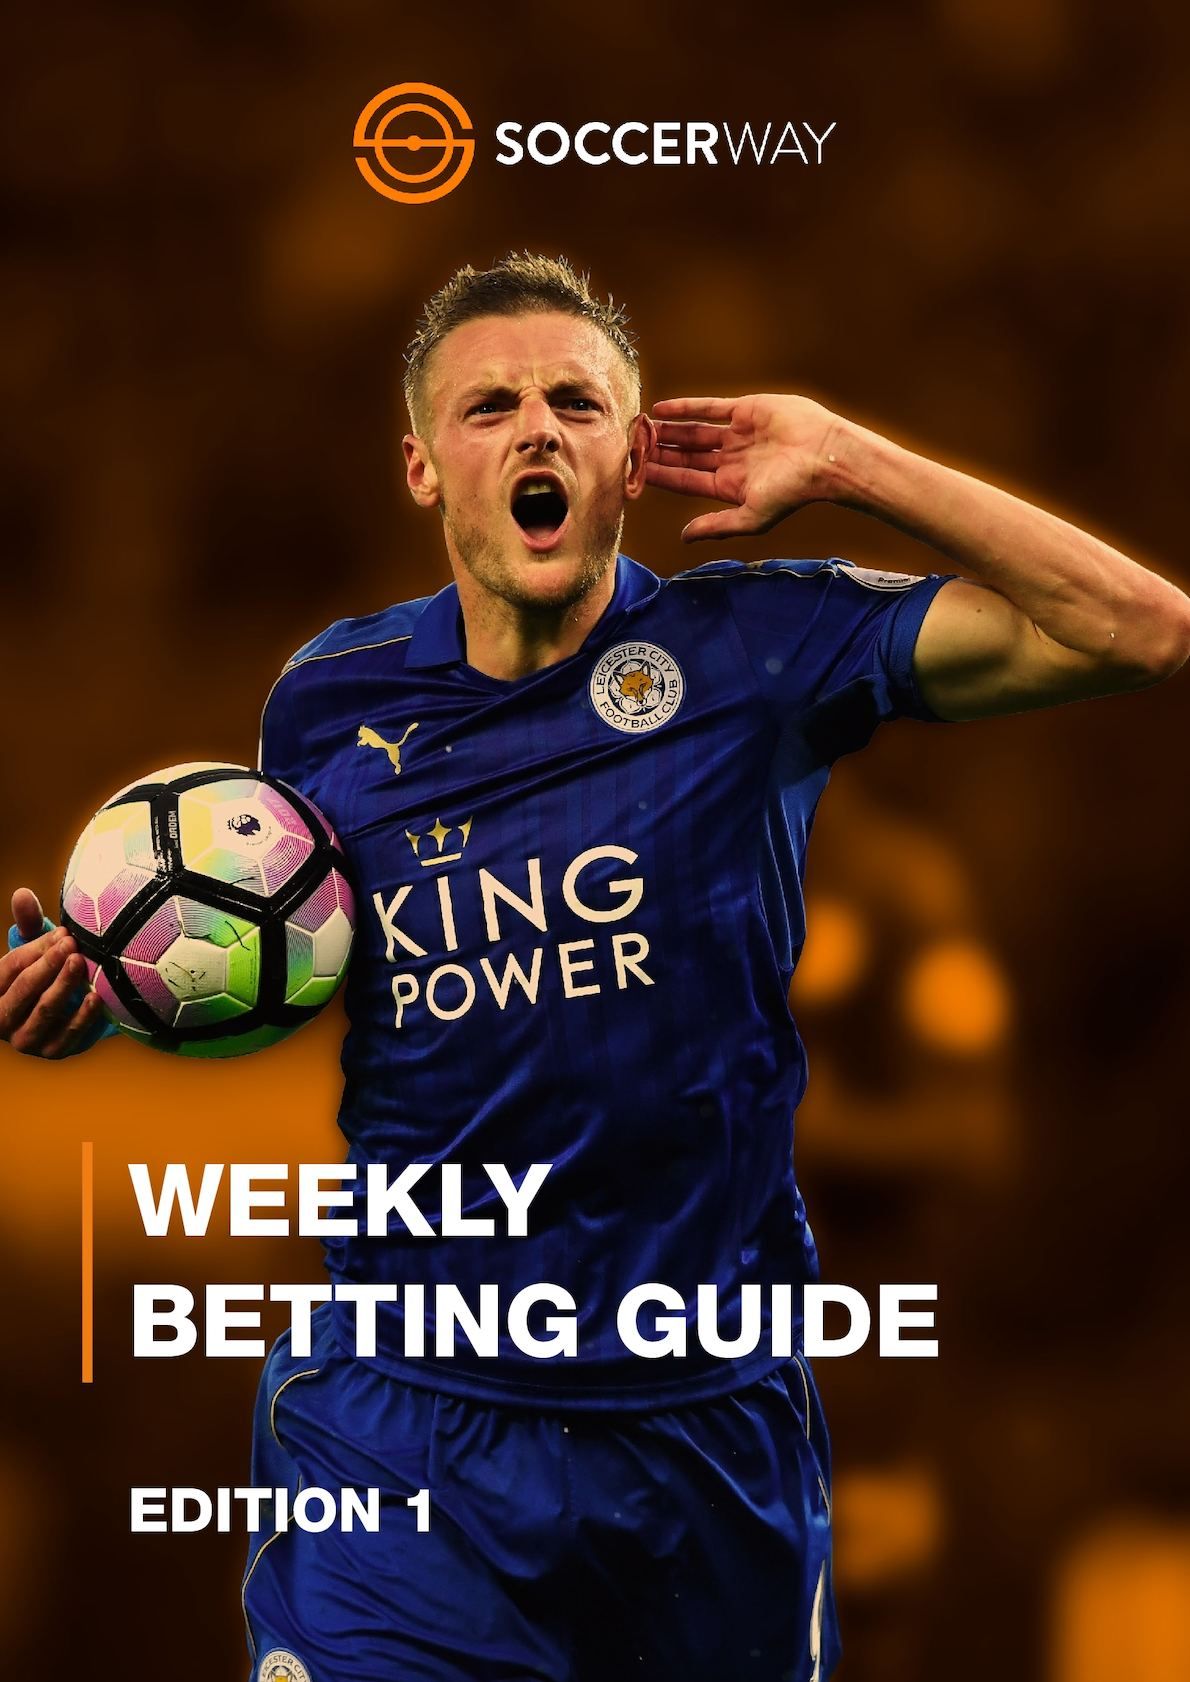 World betting fixtures soccerway nfl week 10 public betting